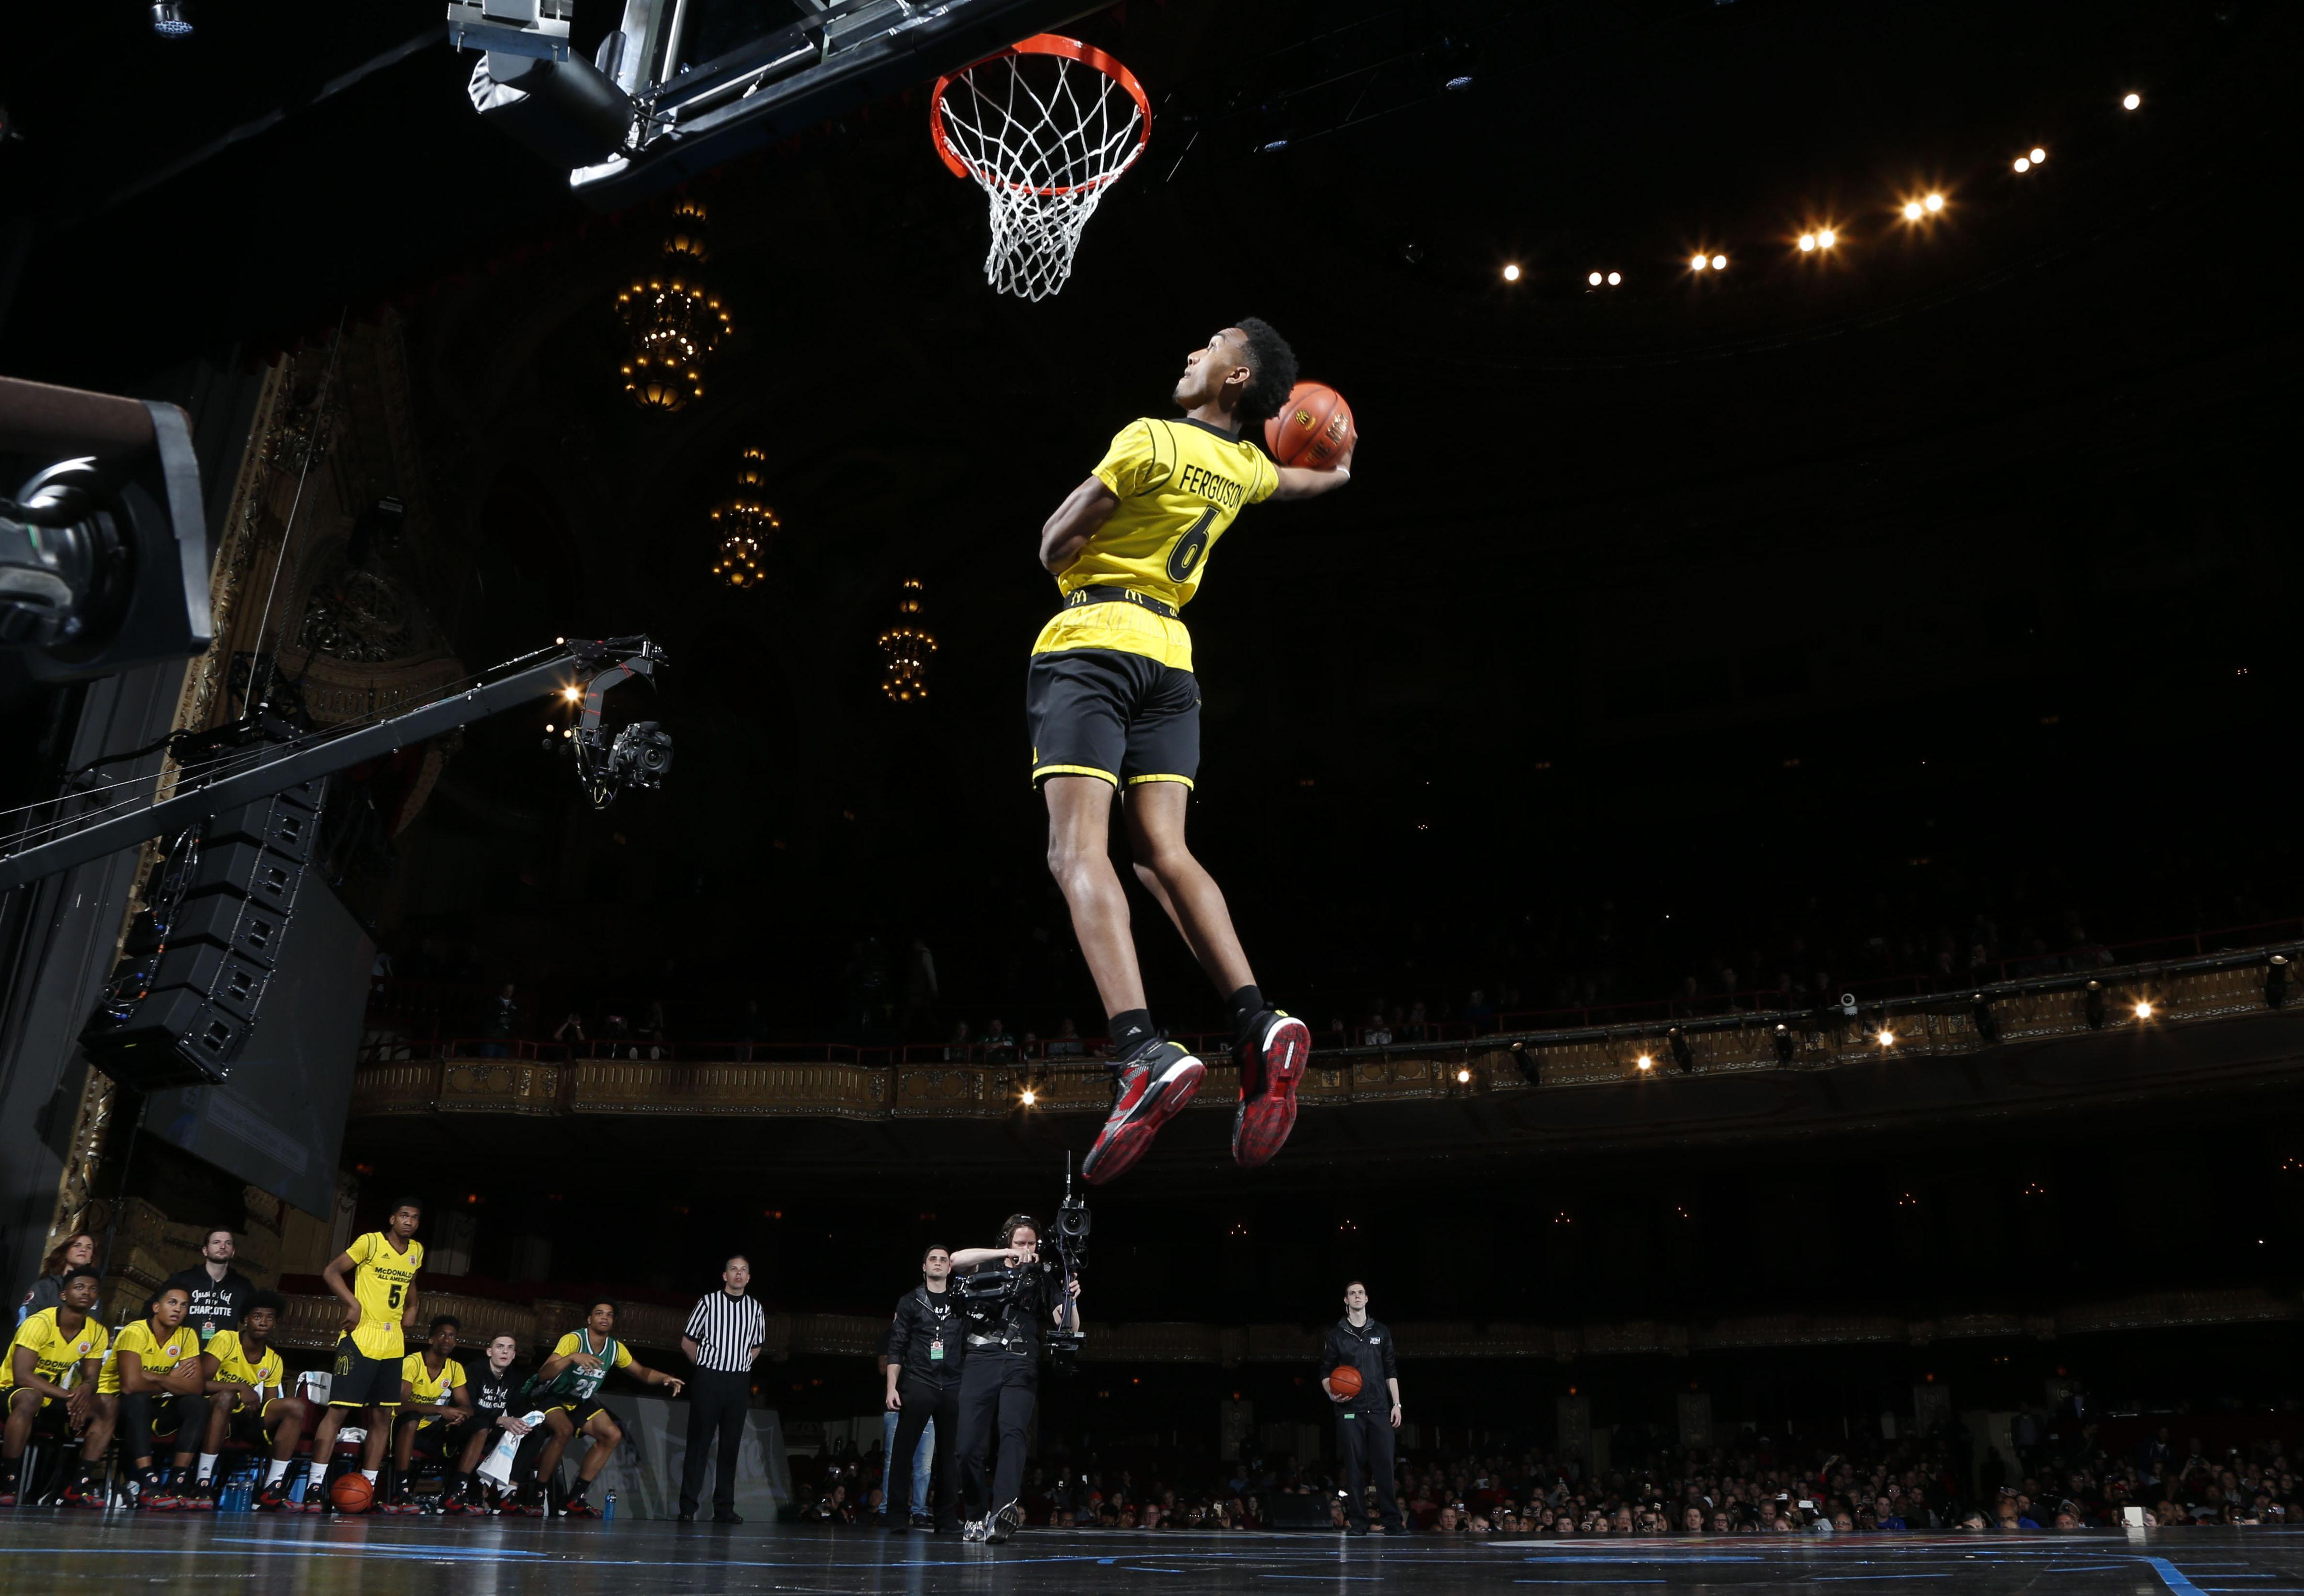 9216608-high-school-basketball-mcdonalds-all-american-jamfest-1